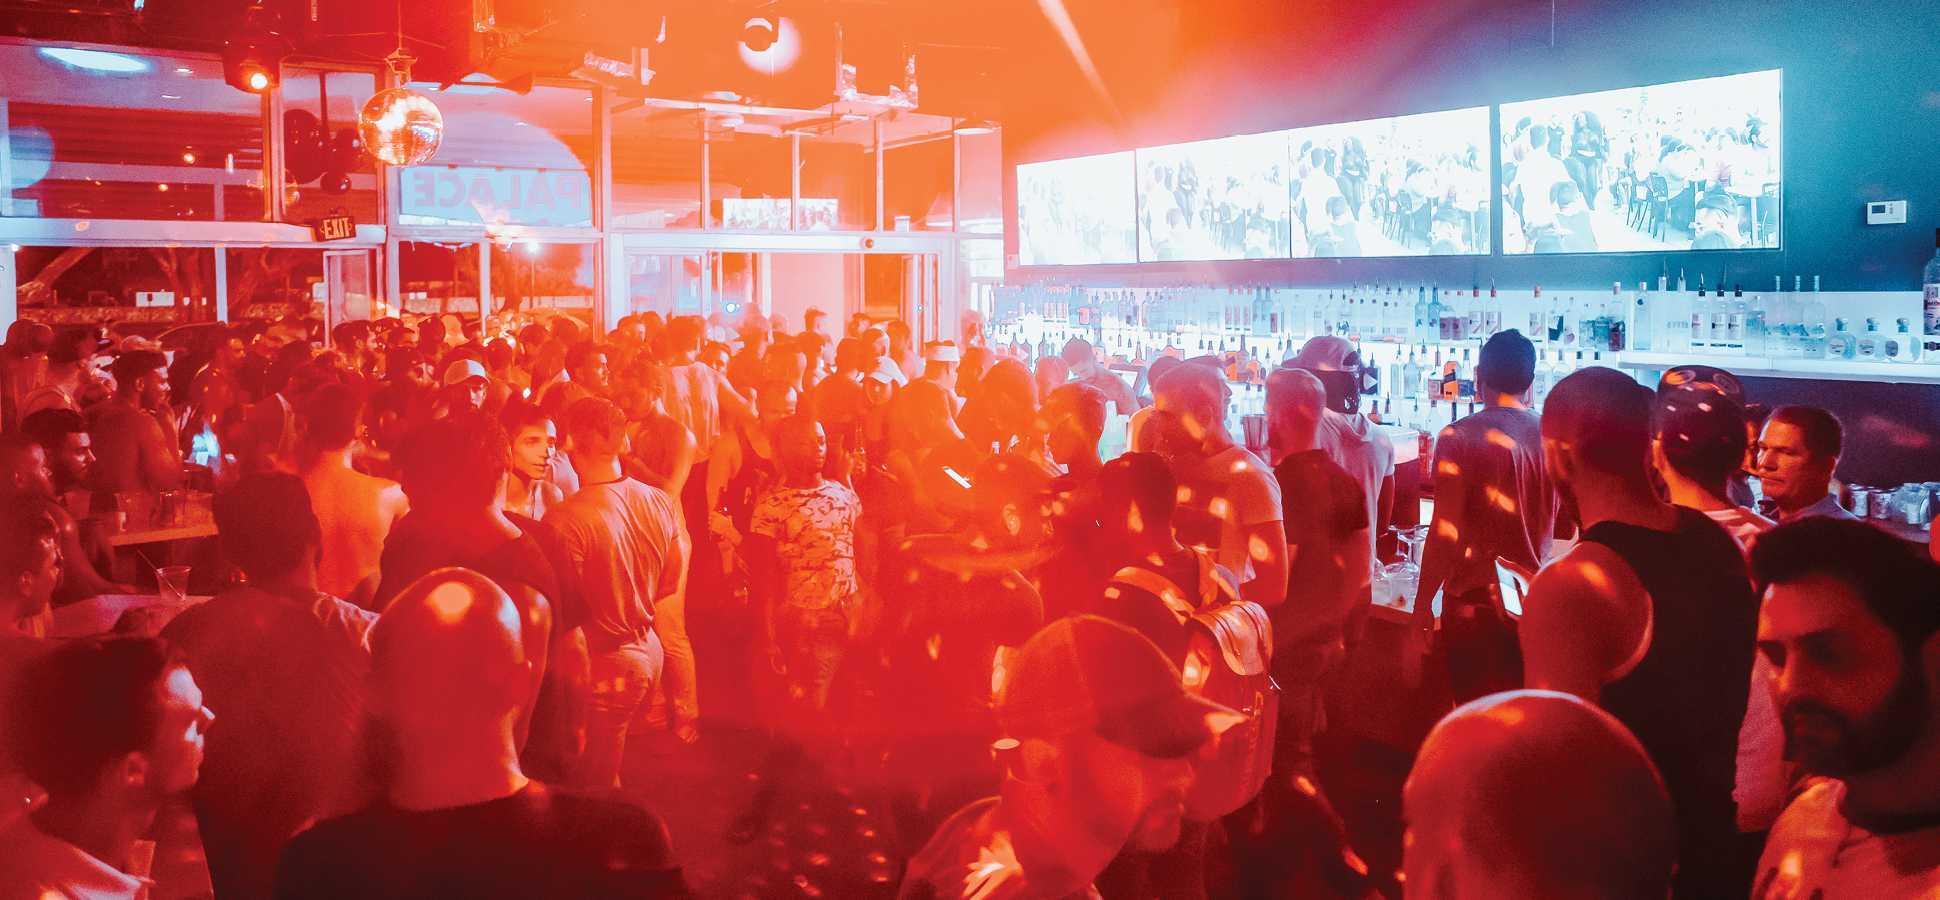 Palace, South Beach's Iconic Drag Venue,Celebrates 31st Anniversary